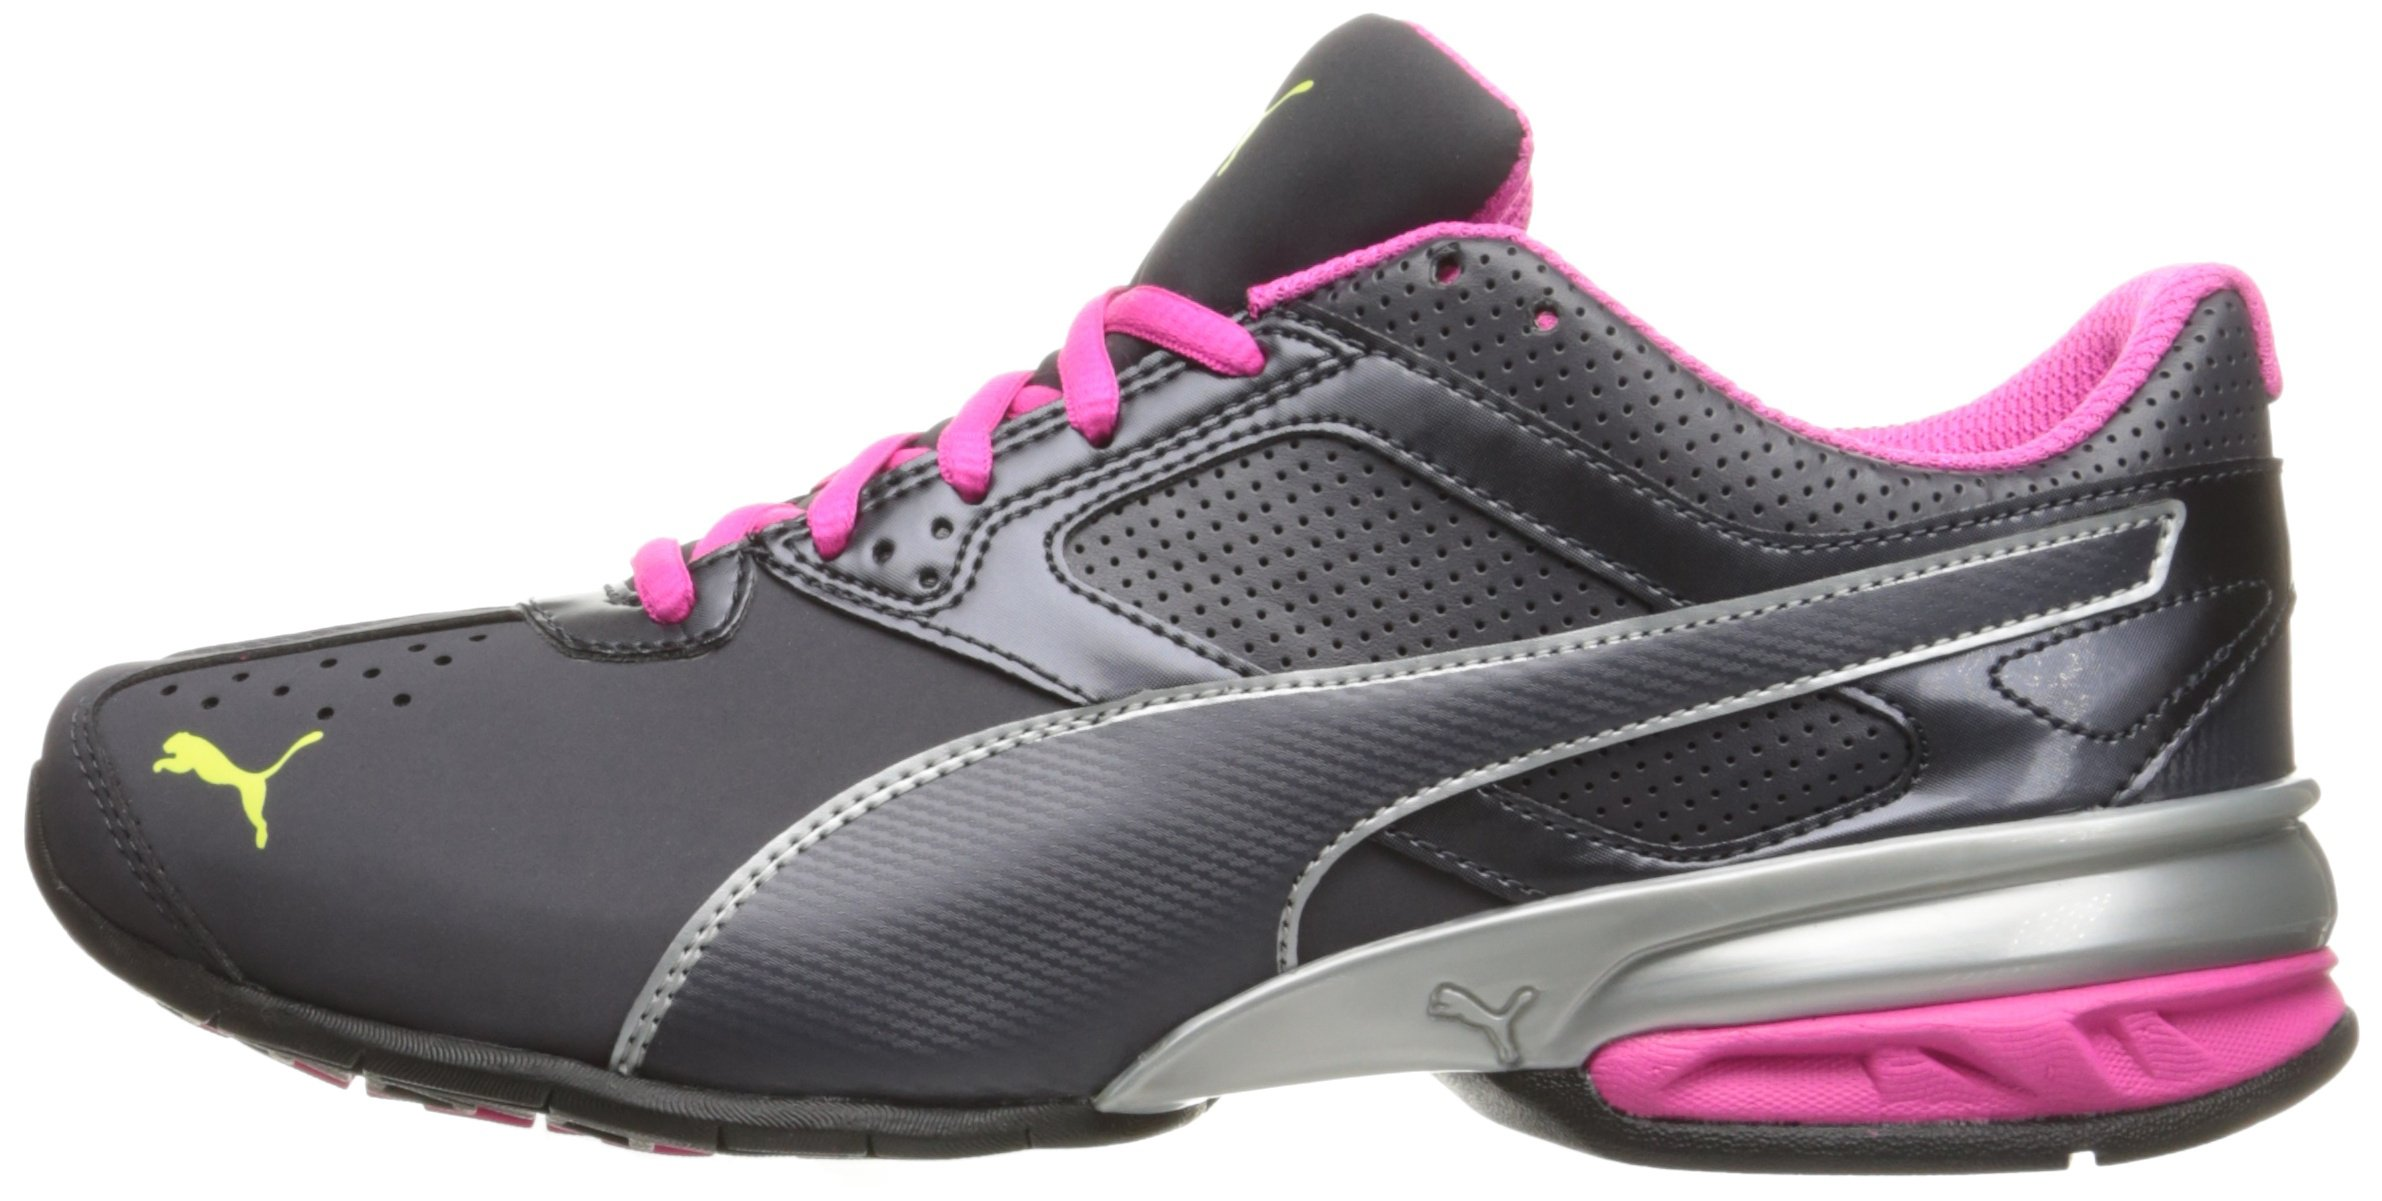 PUMA Women's Tazon 6 WN's fm Sneaker Periscope Silver-Pink glo, 6 M US by PUMA (Image #5)